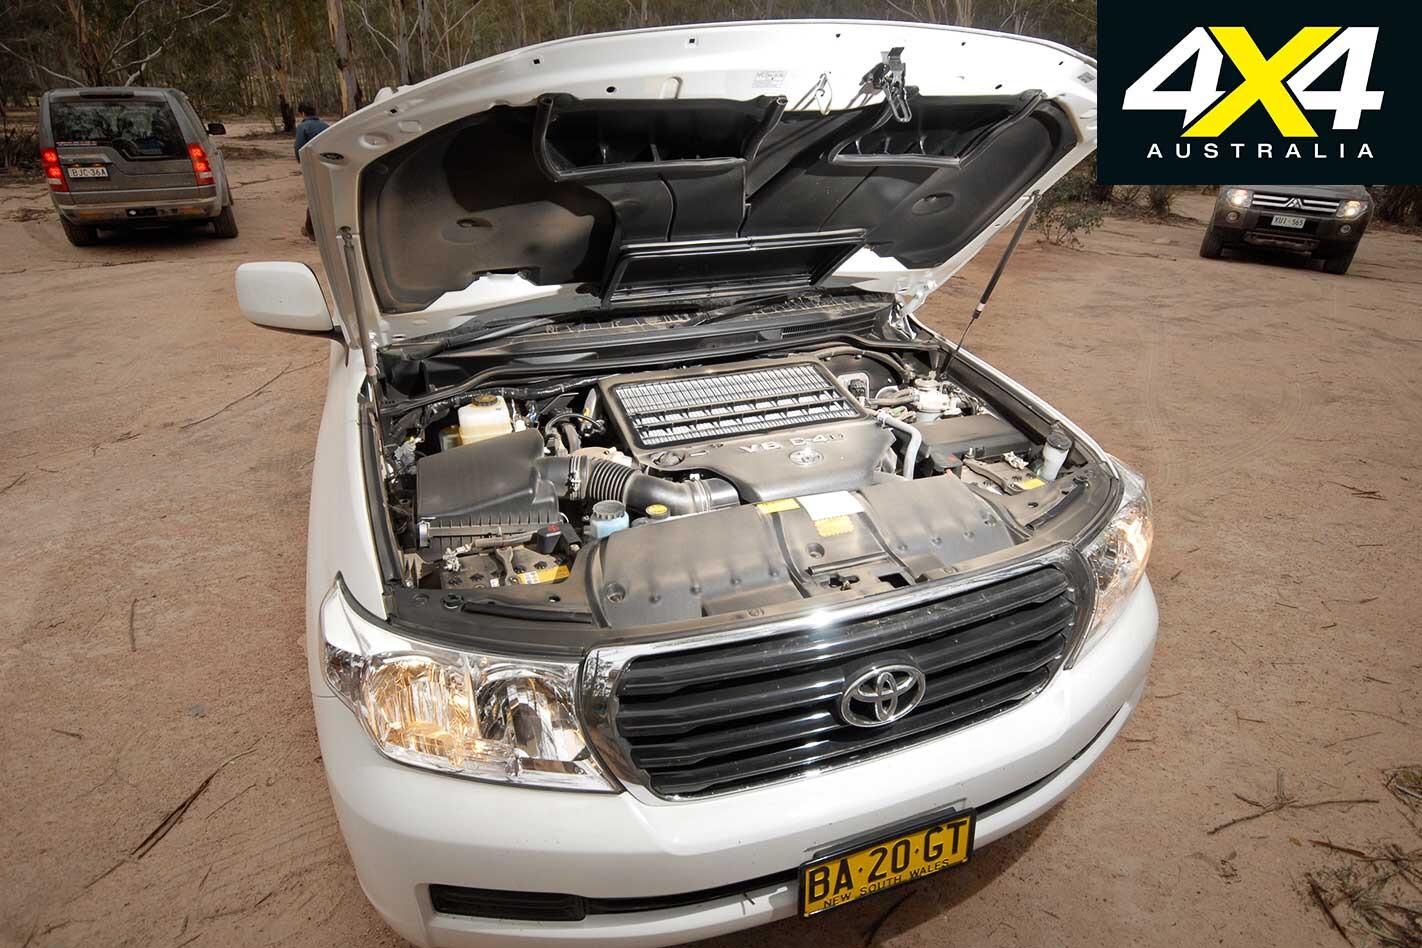 2009 Toyota Land Cruiser Engine Jpg